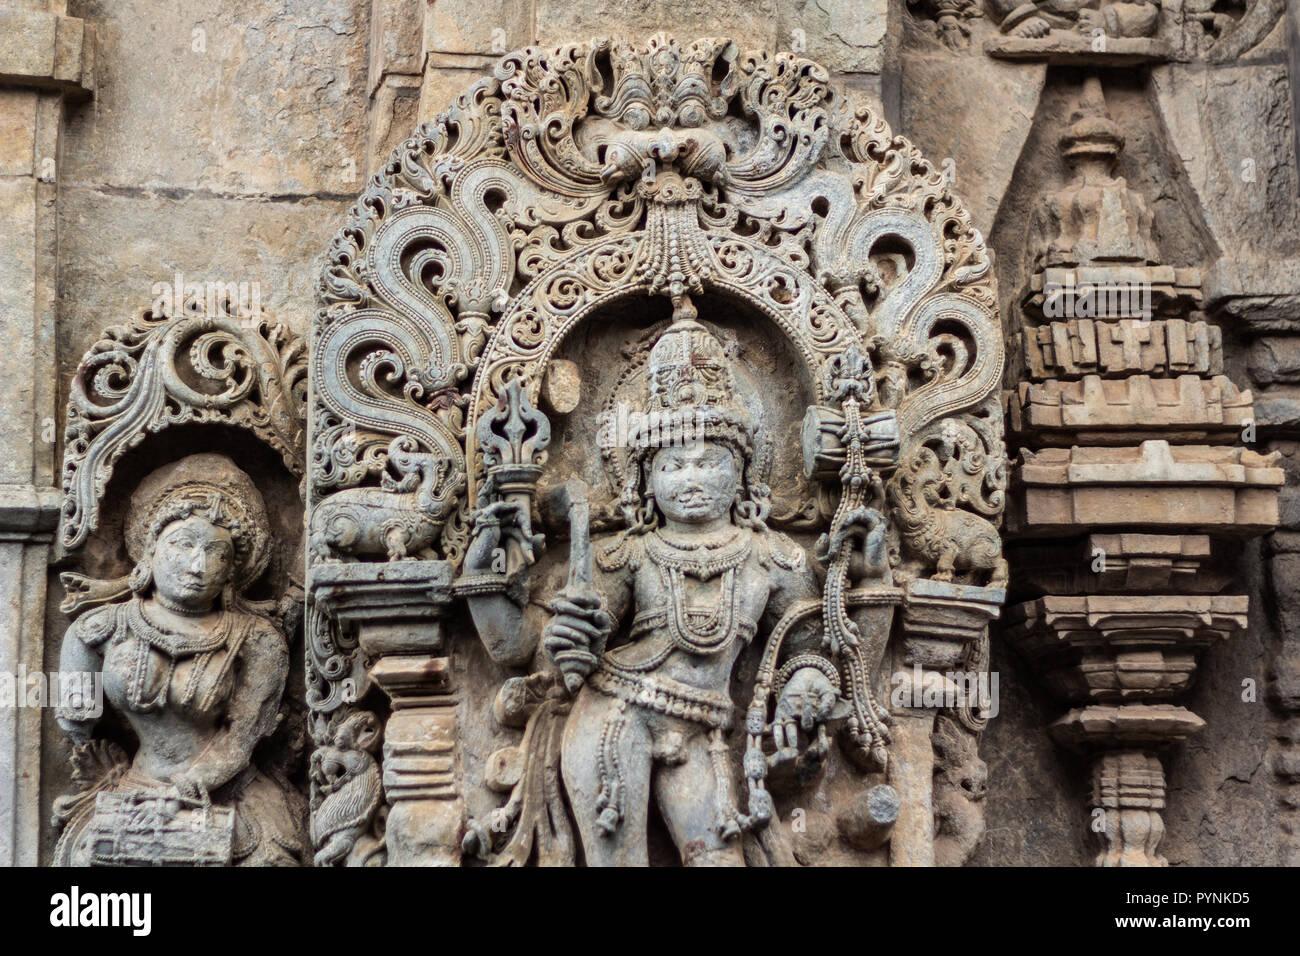 Intricate carvings of Hindu deities and Puranic stories in Belur and Halebid temple premise. Belur, Karnataka, India. - Stock Image